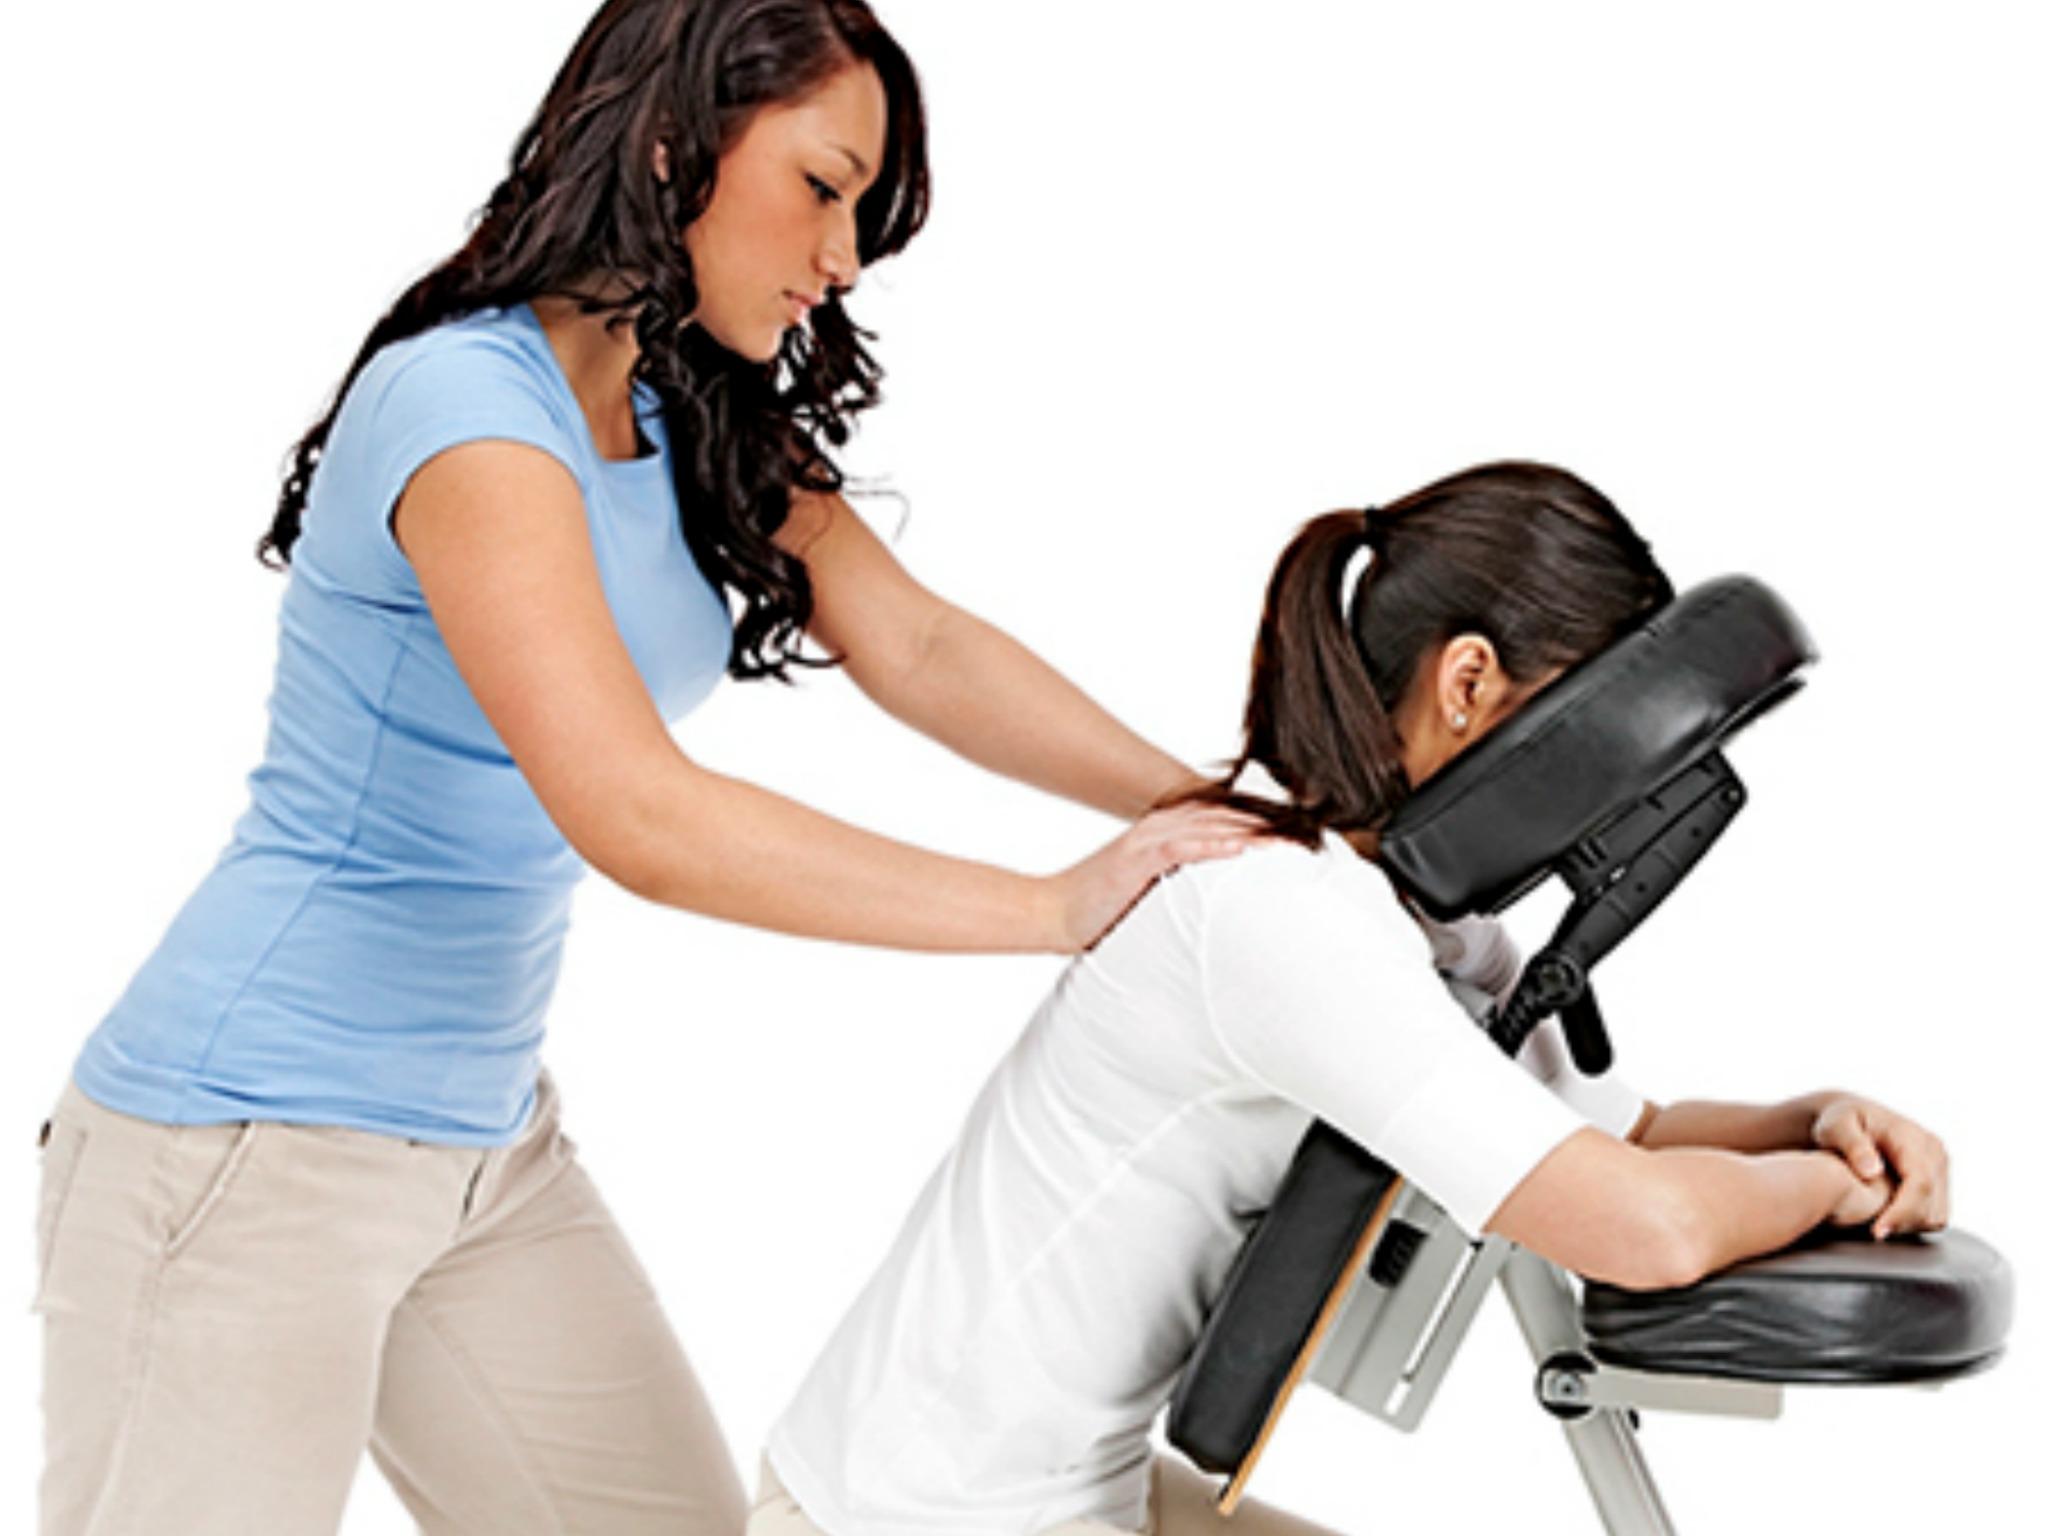 chair-massage-massageyeah